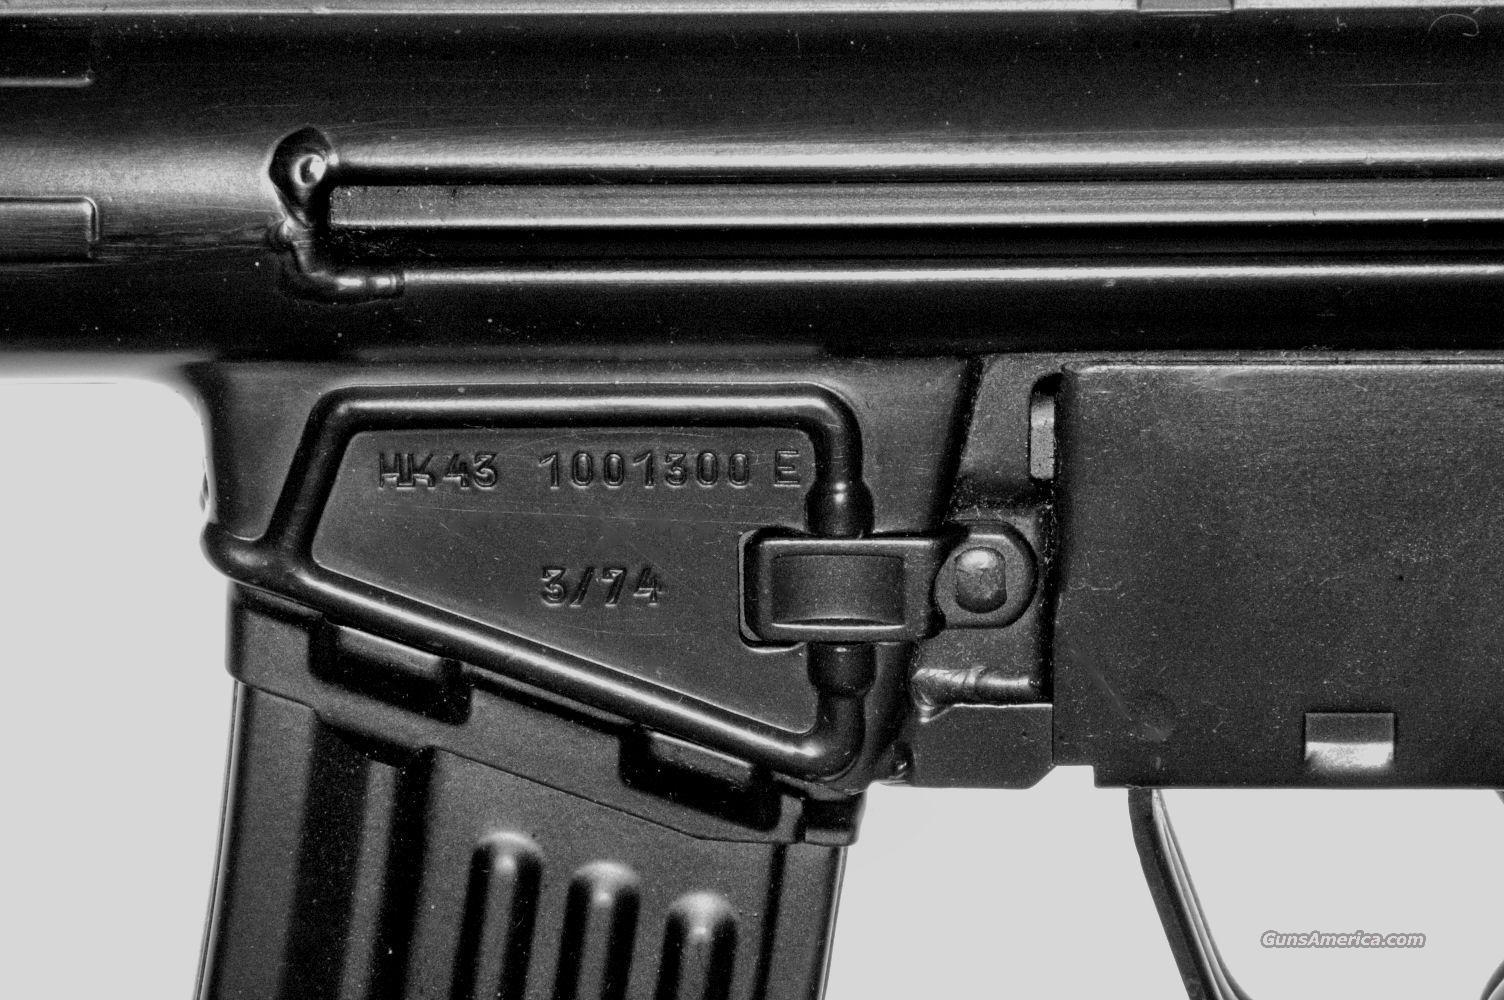 H&K HK43